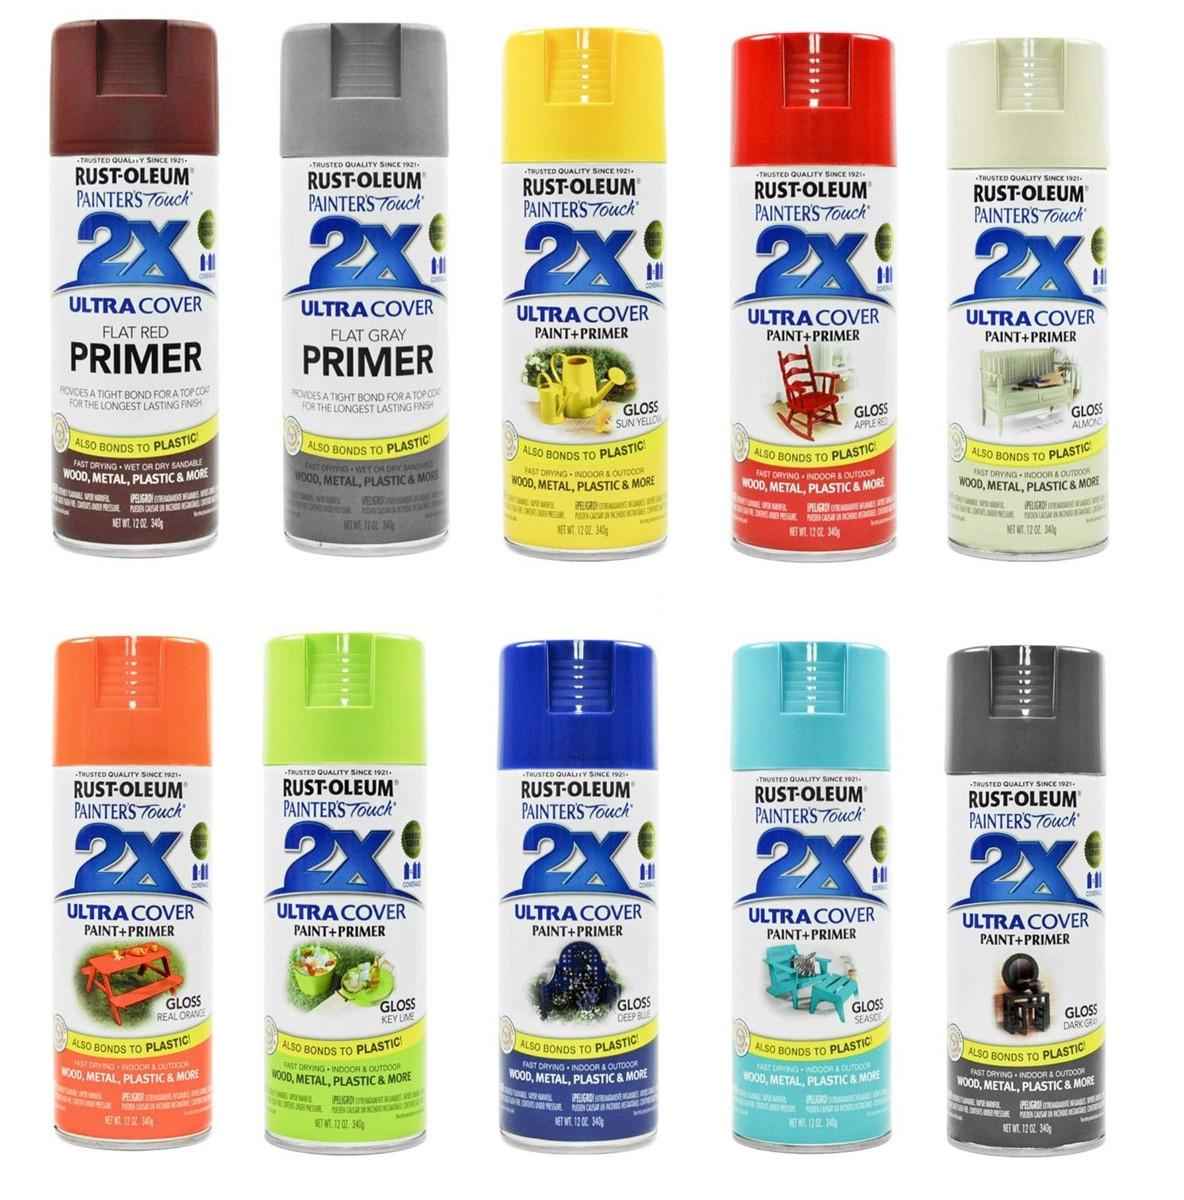 Best ideas about Rustoleum 2X Spray Paint Colors . Save or Pin Rust oleum Spray Paints & Primers Now.